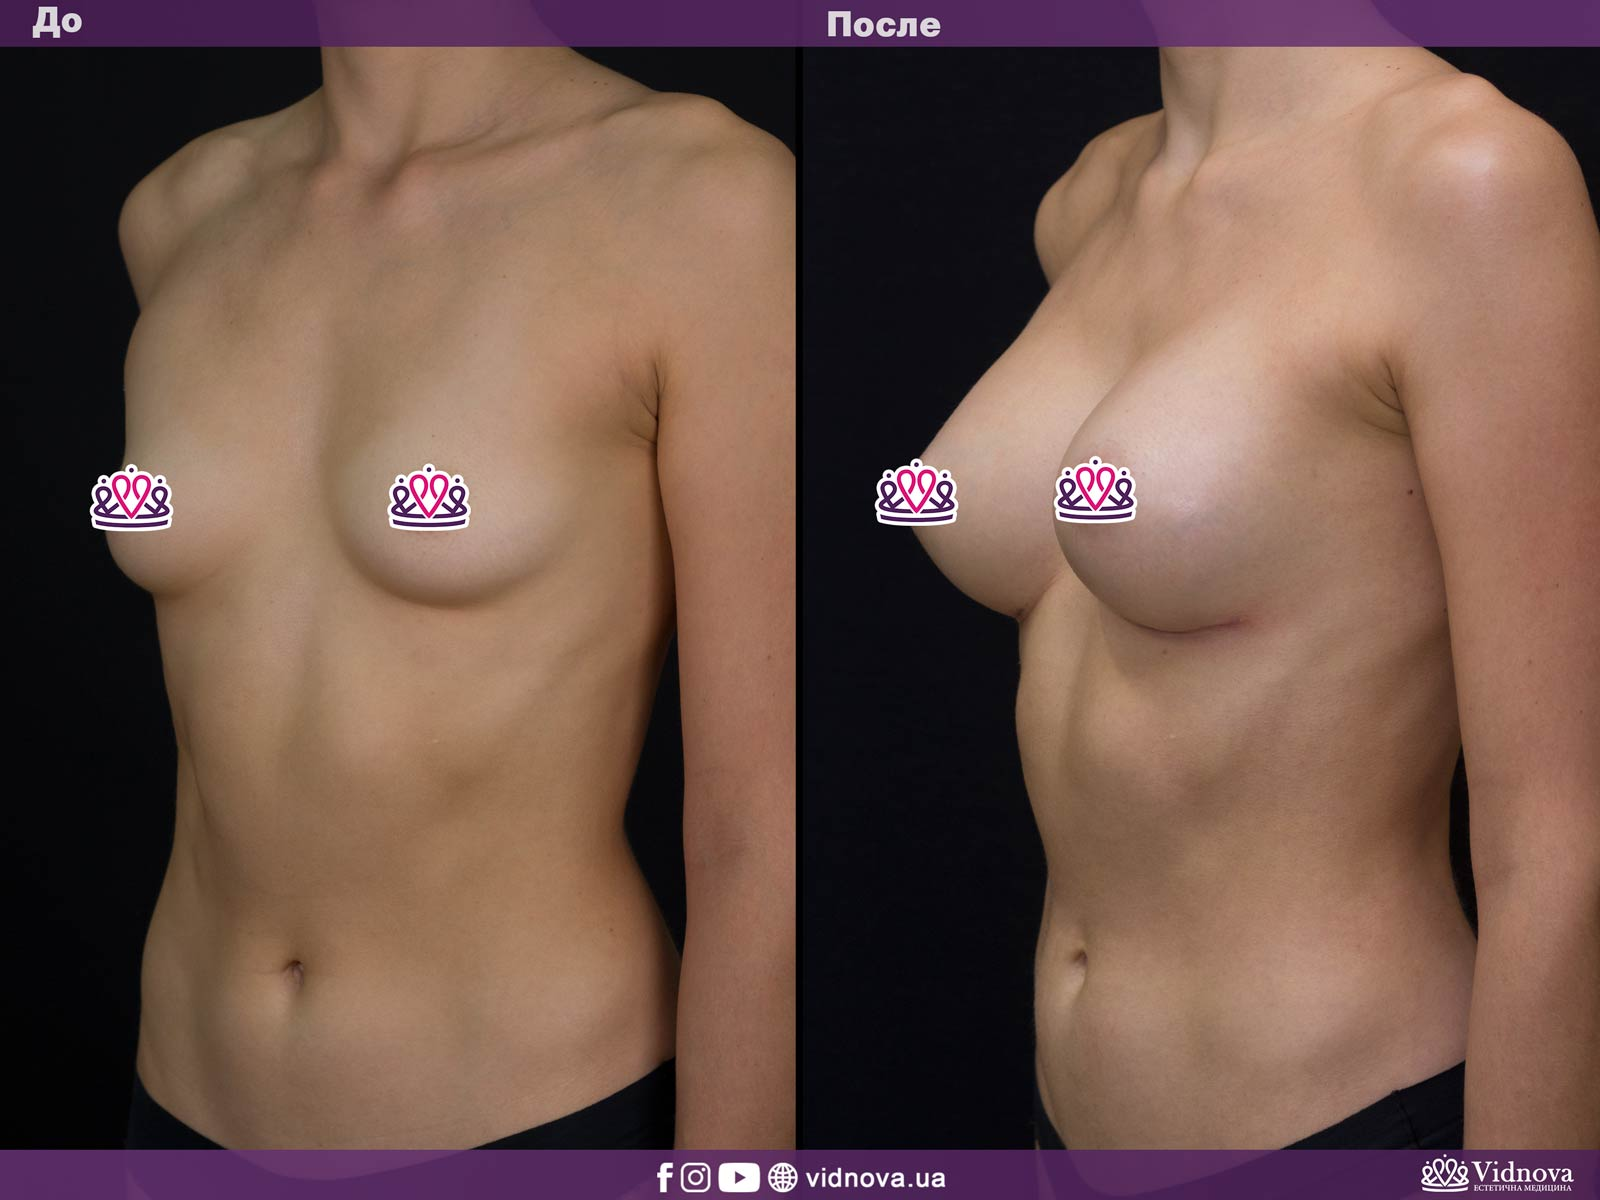 Увеличение груди: Фото ДО и ПОСЛЕ - Пример №2-2 - Клиника Vidnova